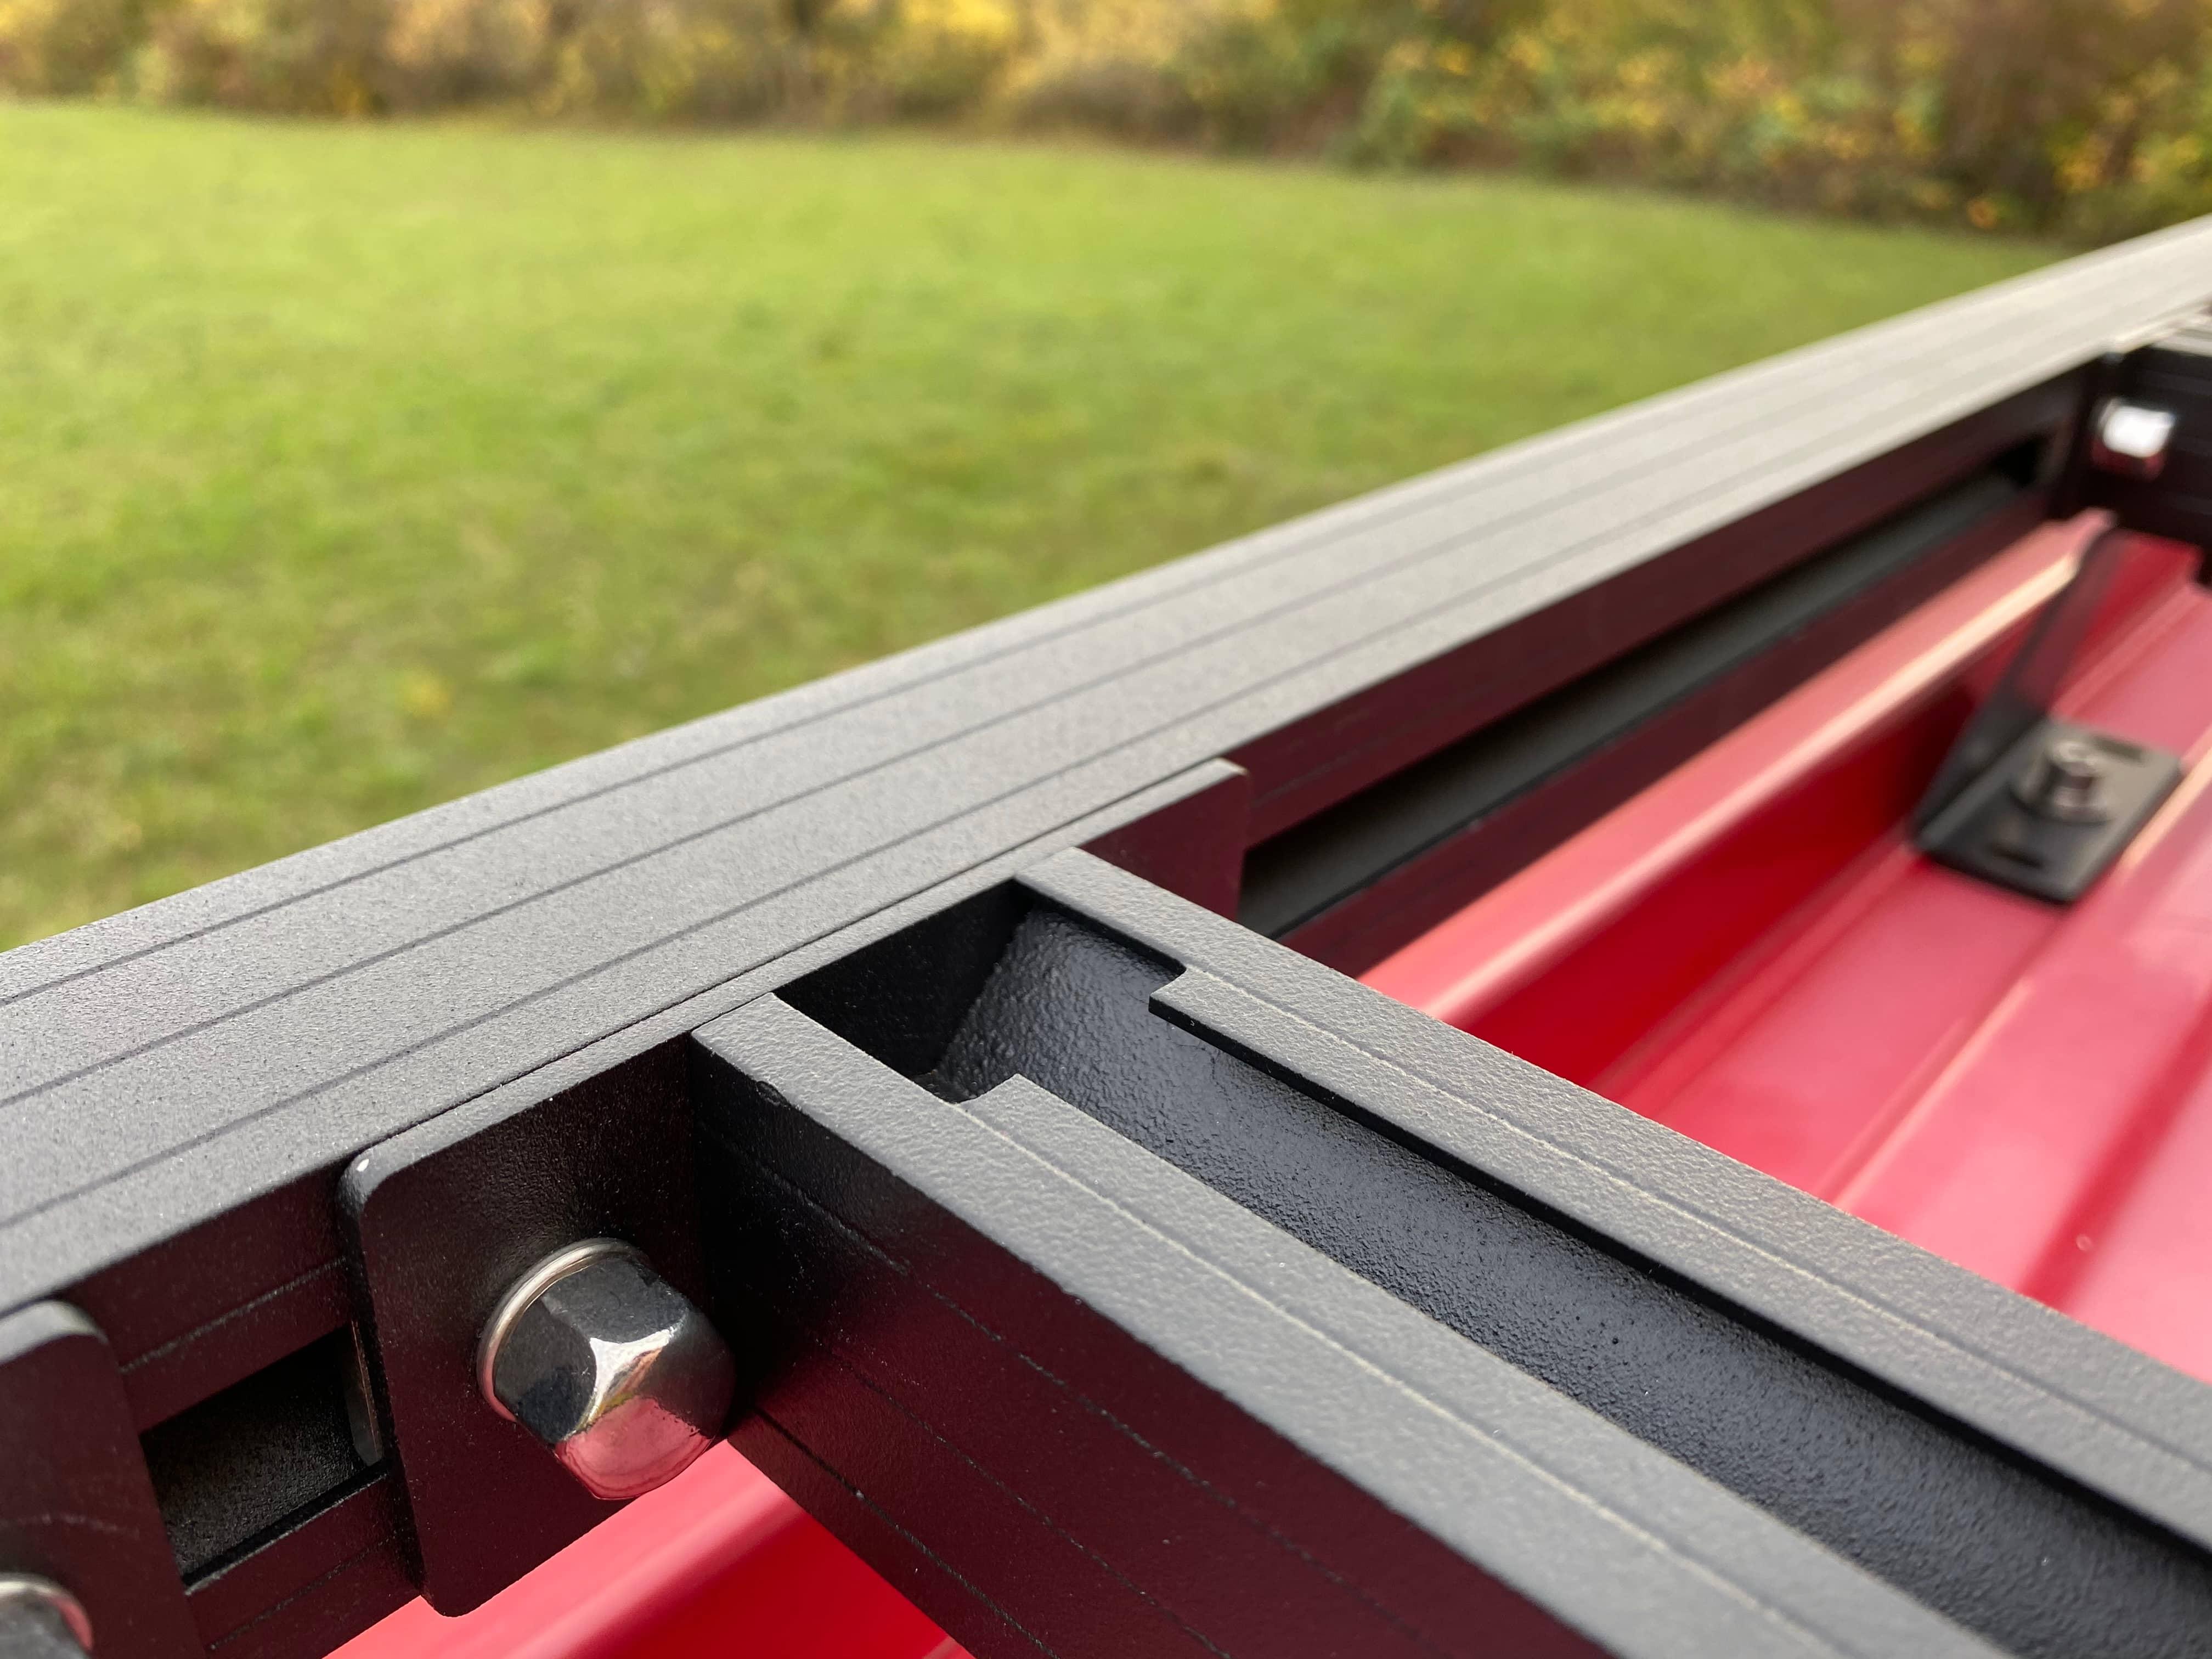 Dachträger mit Nutensystem auf rotem Auto